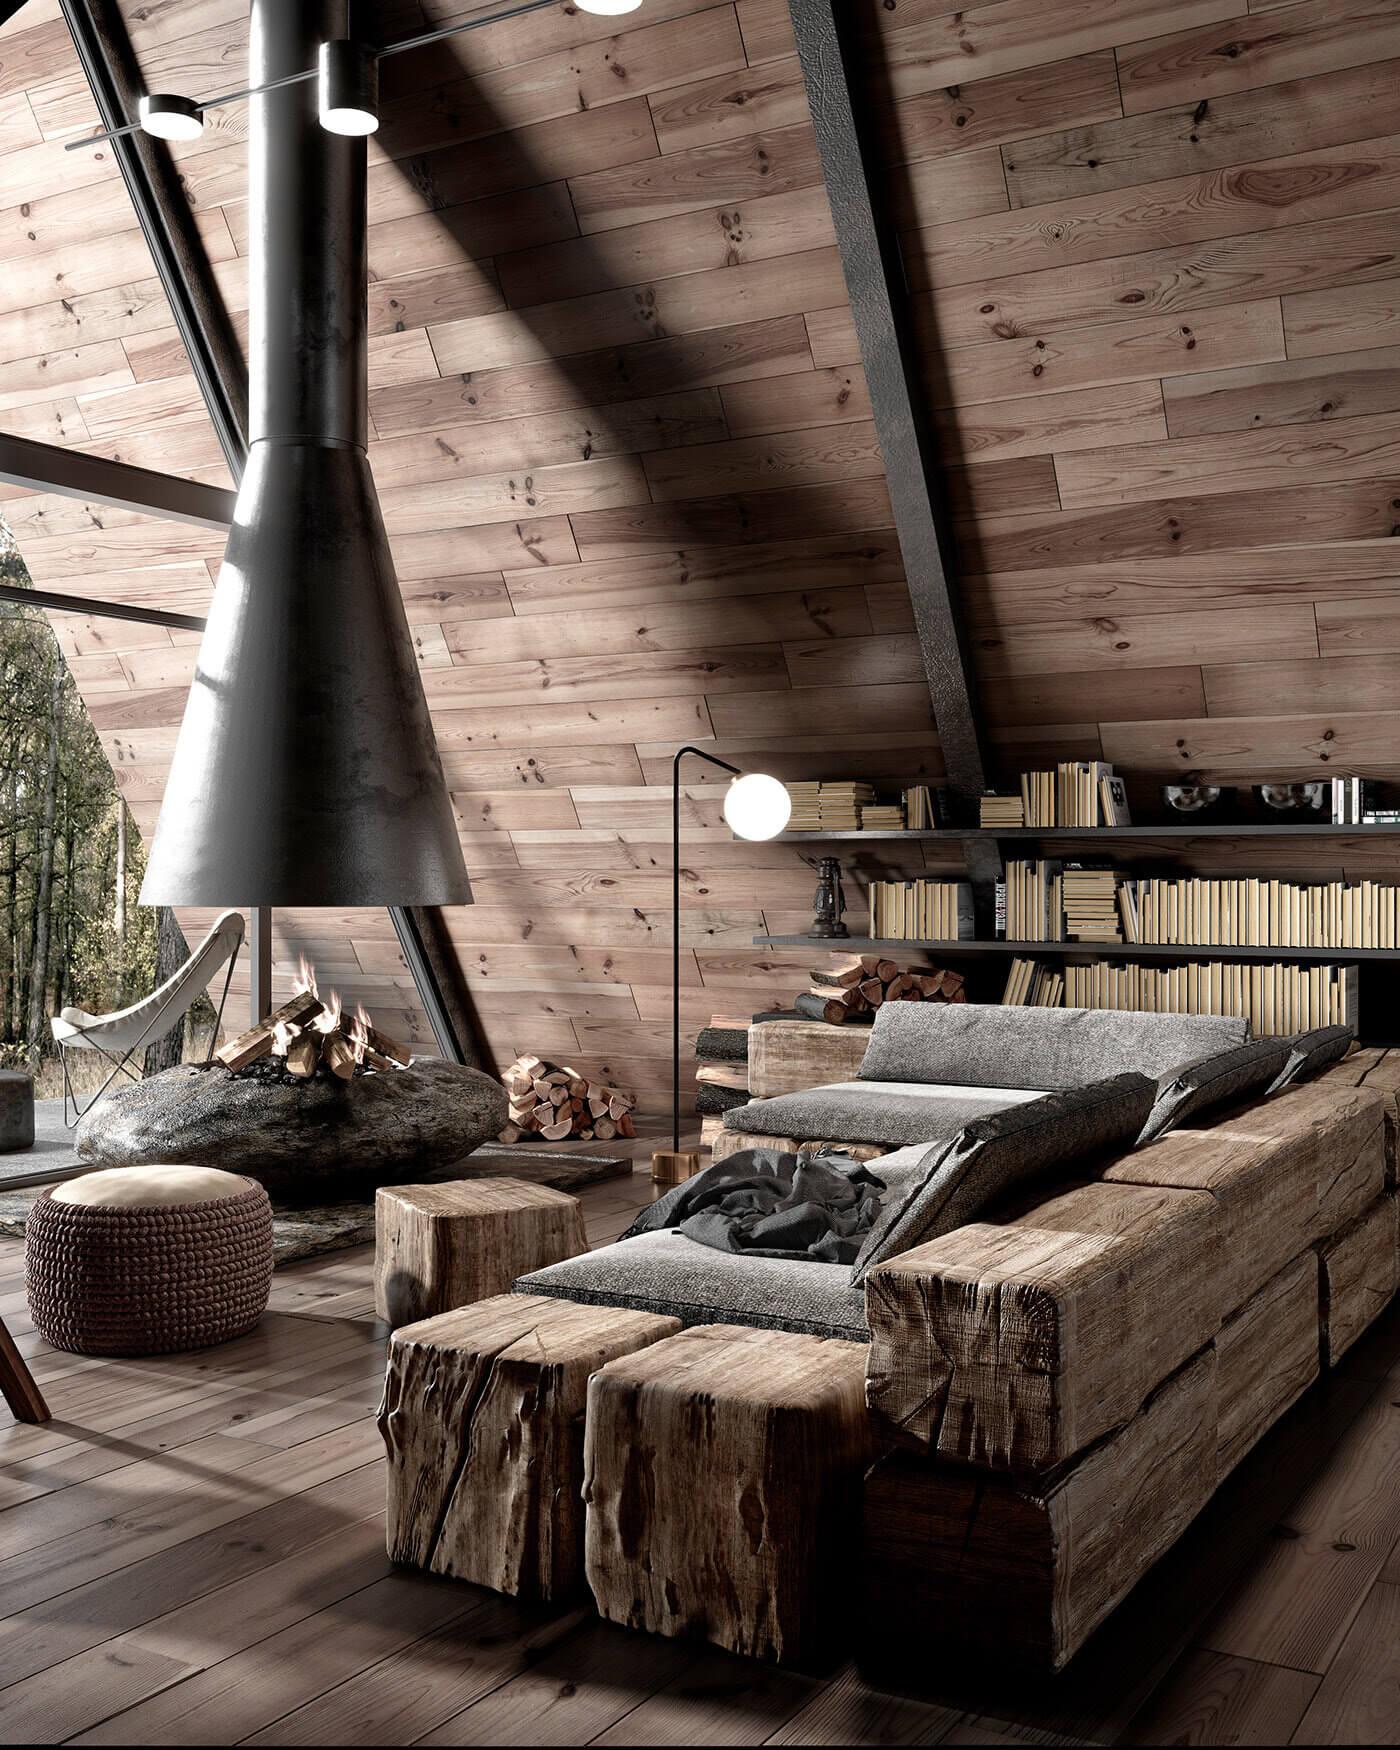 A Modern Wooden A-Frame Cabin in Lake Tahoe, California